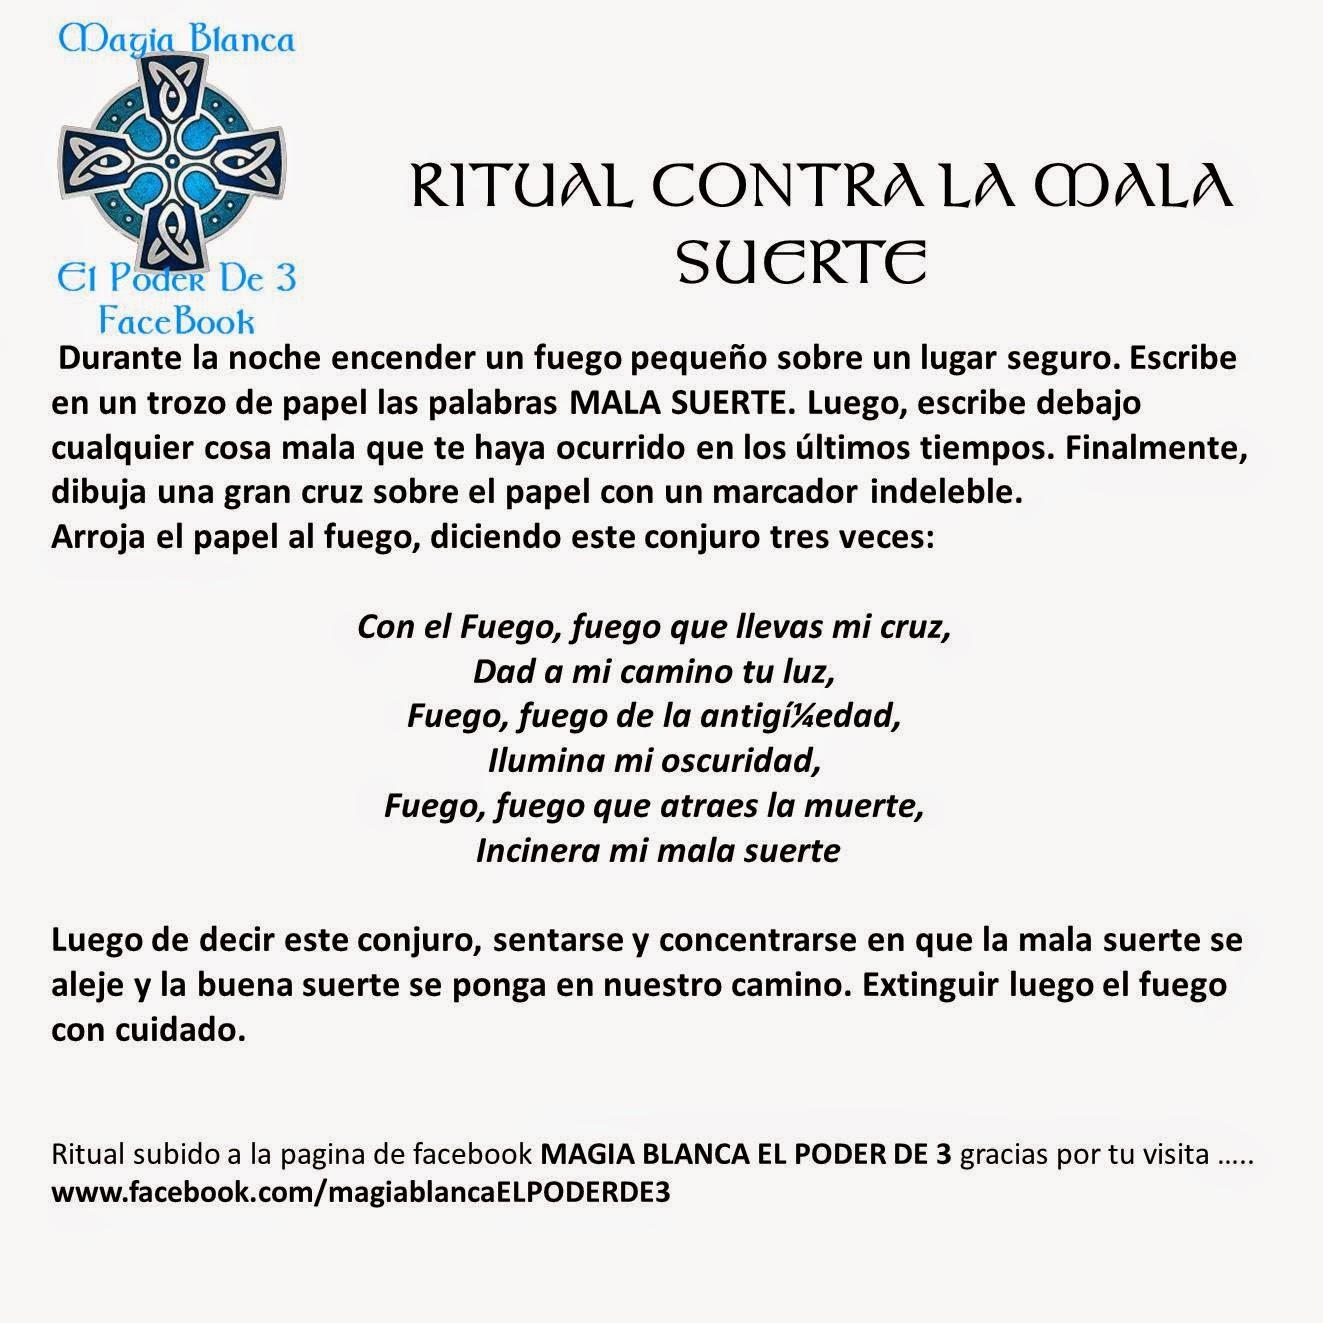 1000 ideas about hechizos de magia blanca on pinterest - Ritual para la suerte ...